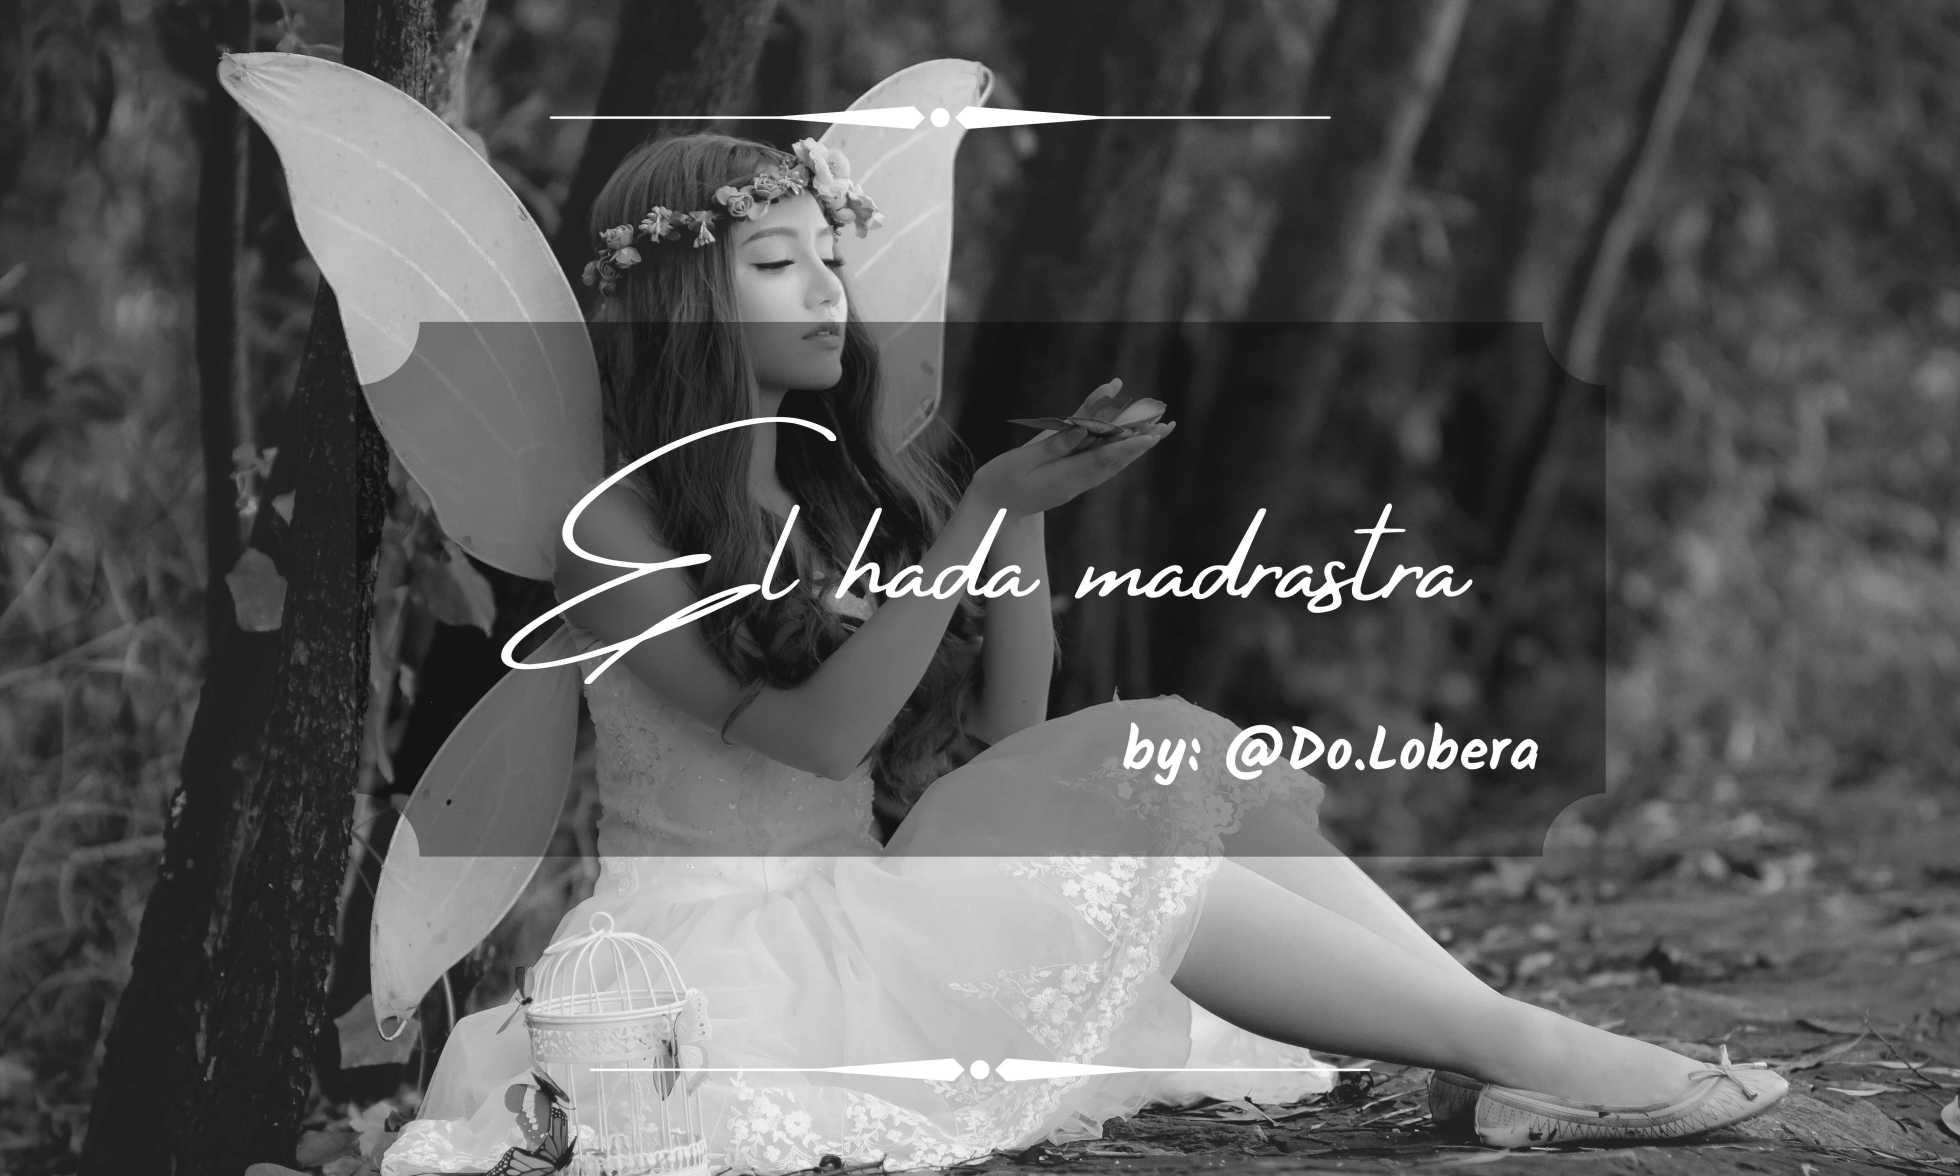 El hada madrastra - By do.lobera